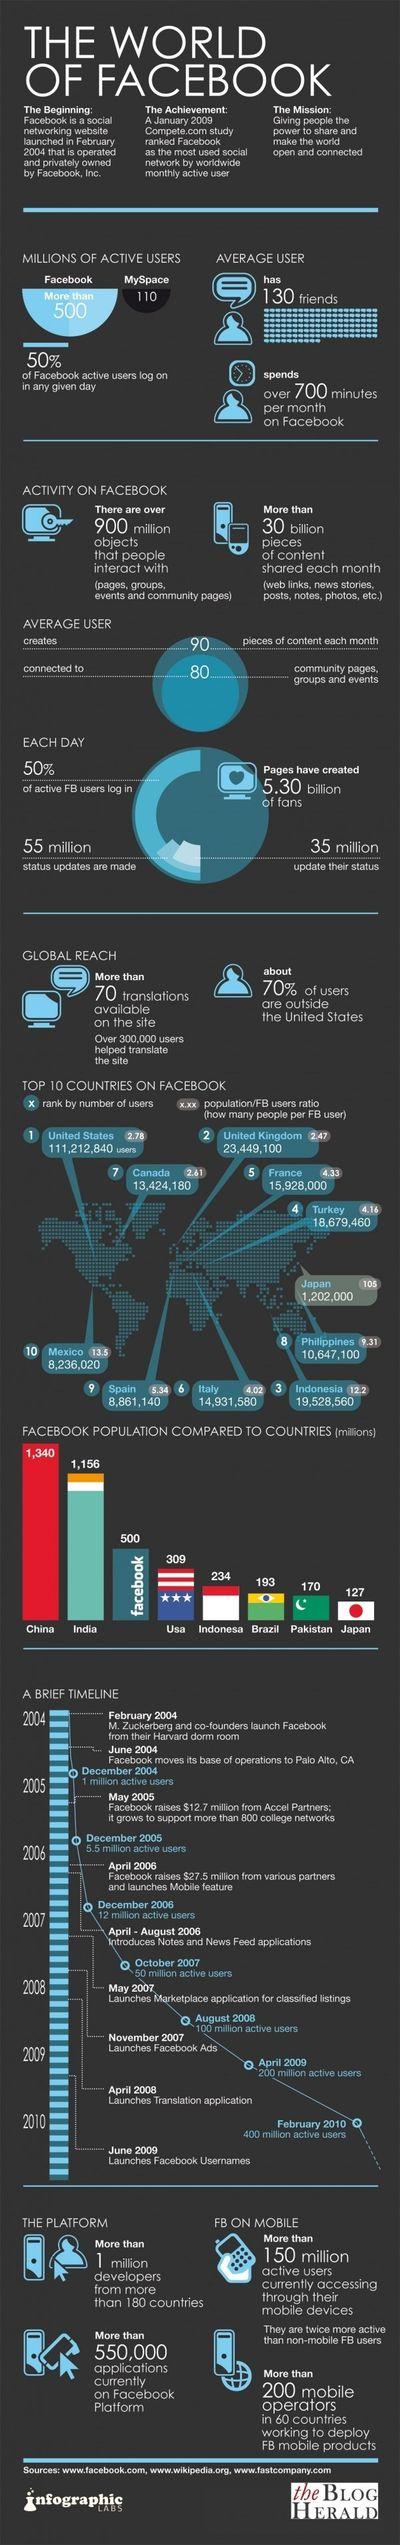 World of facebook 1010